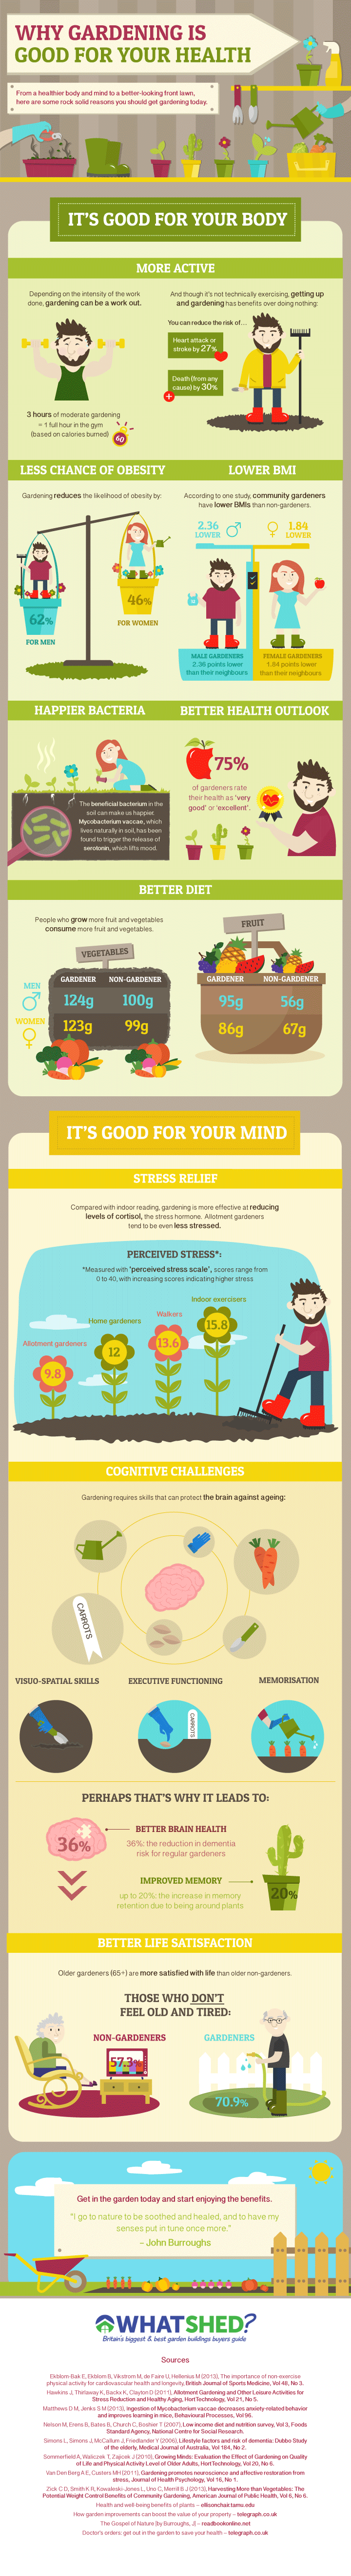 Health Benefits Of Gardening - Infographic